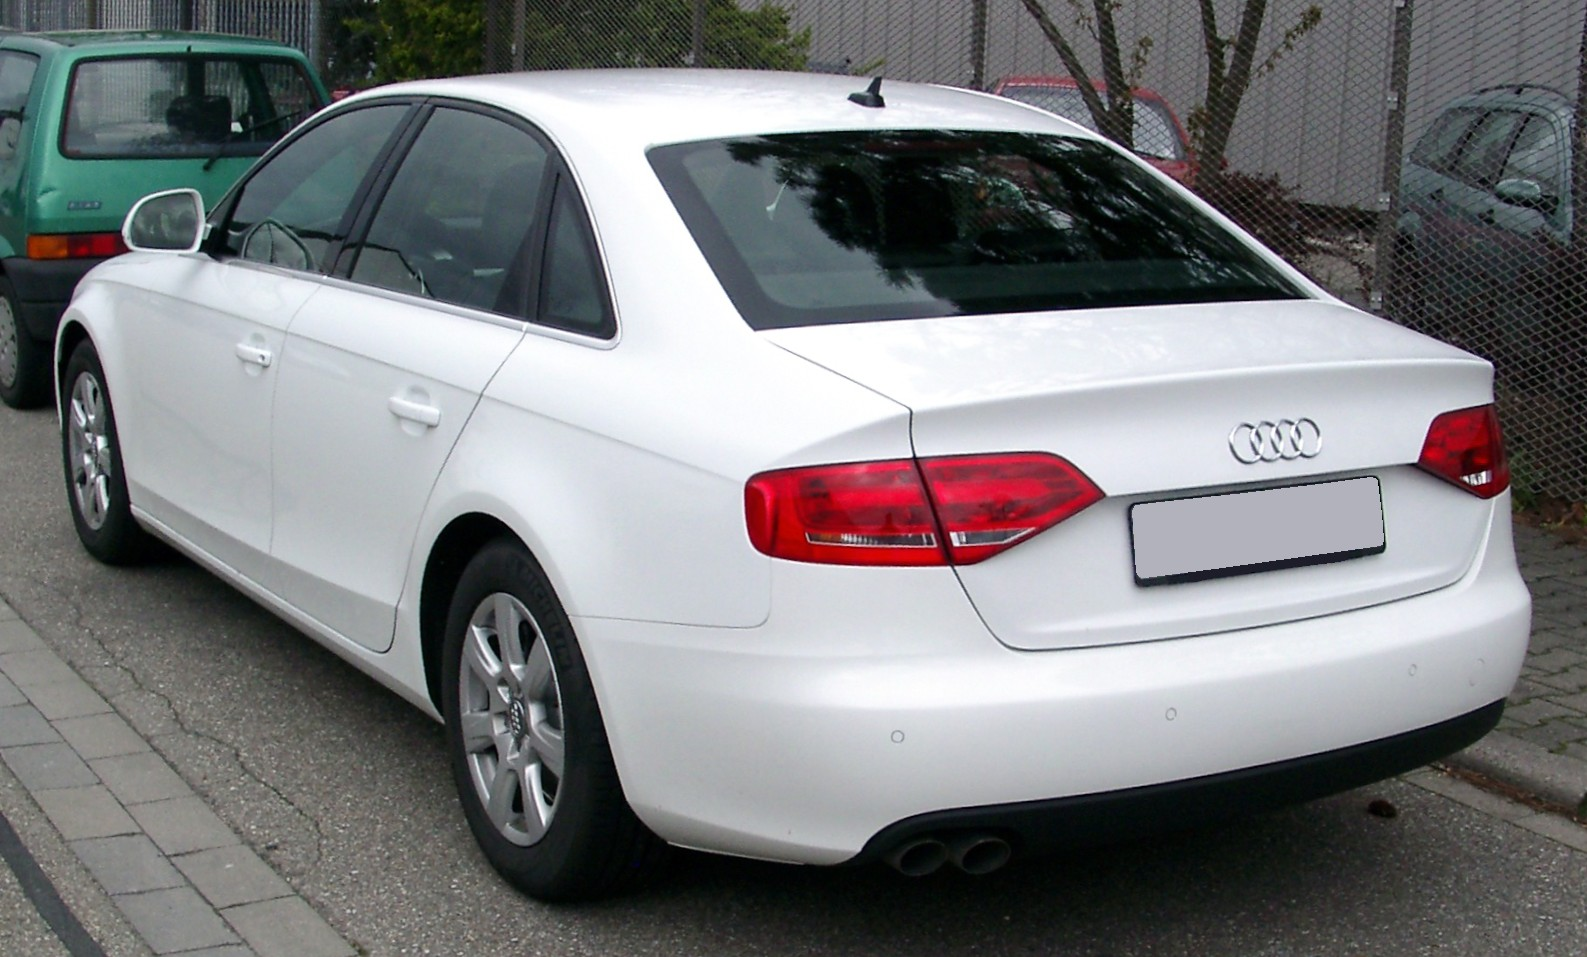 http://1.bp.blogspot.com/-XBTb3Vl9IAc/UTtXB1vCzDI/AAAAAAAAAo0/cSP0832pEww/s1600/Audi_A4_B8_rear_20080414.jpg